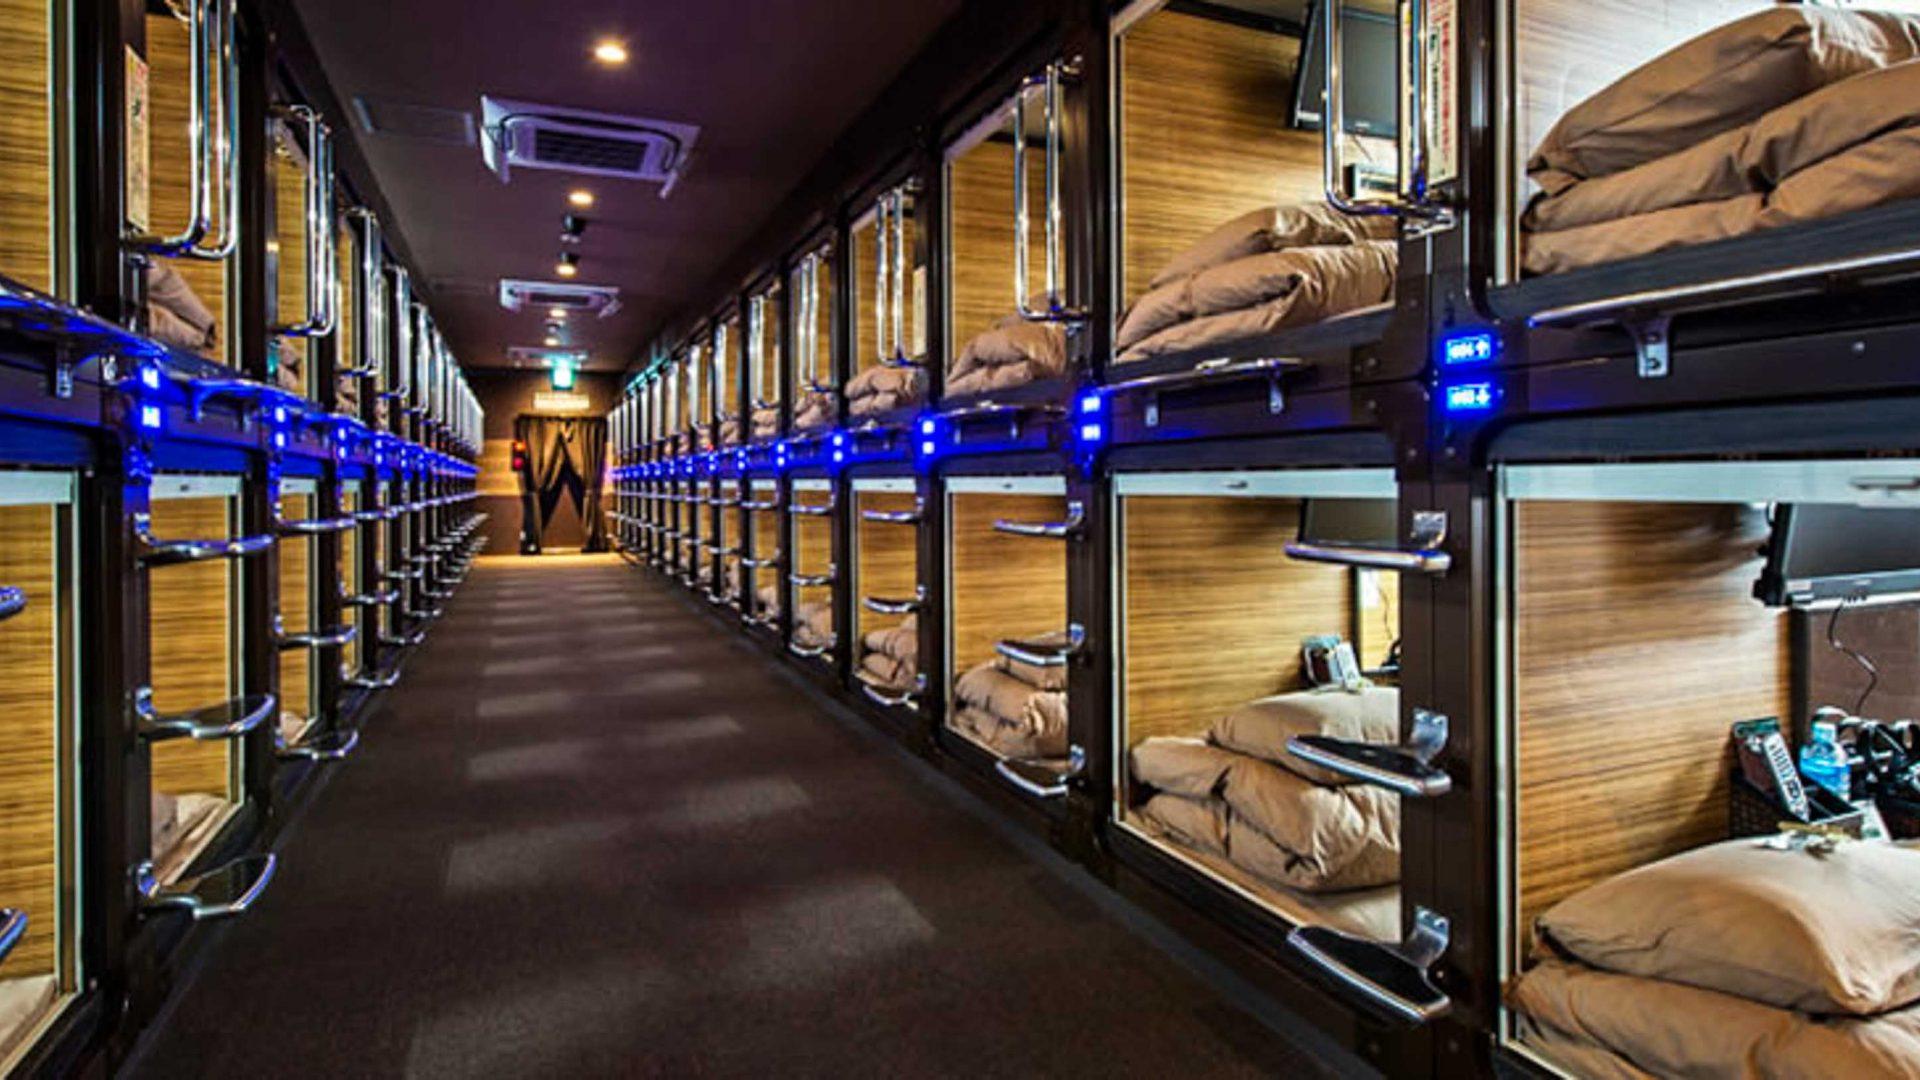 Inside Tokyo's capsule hotels: Rows of capsule rooms at Anshin Oyado.